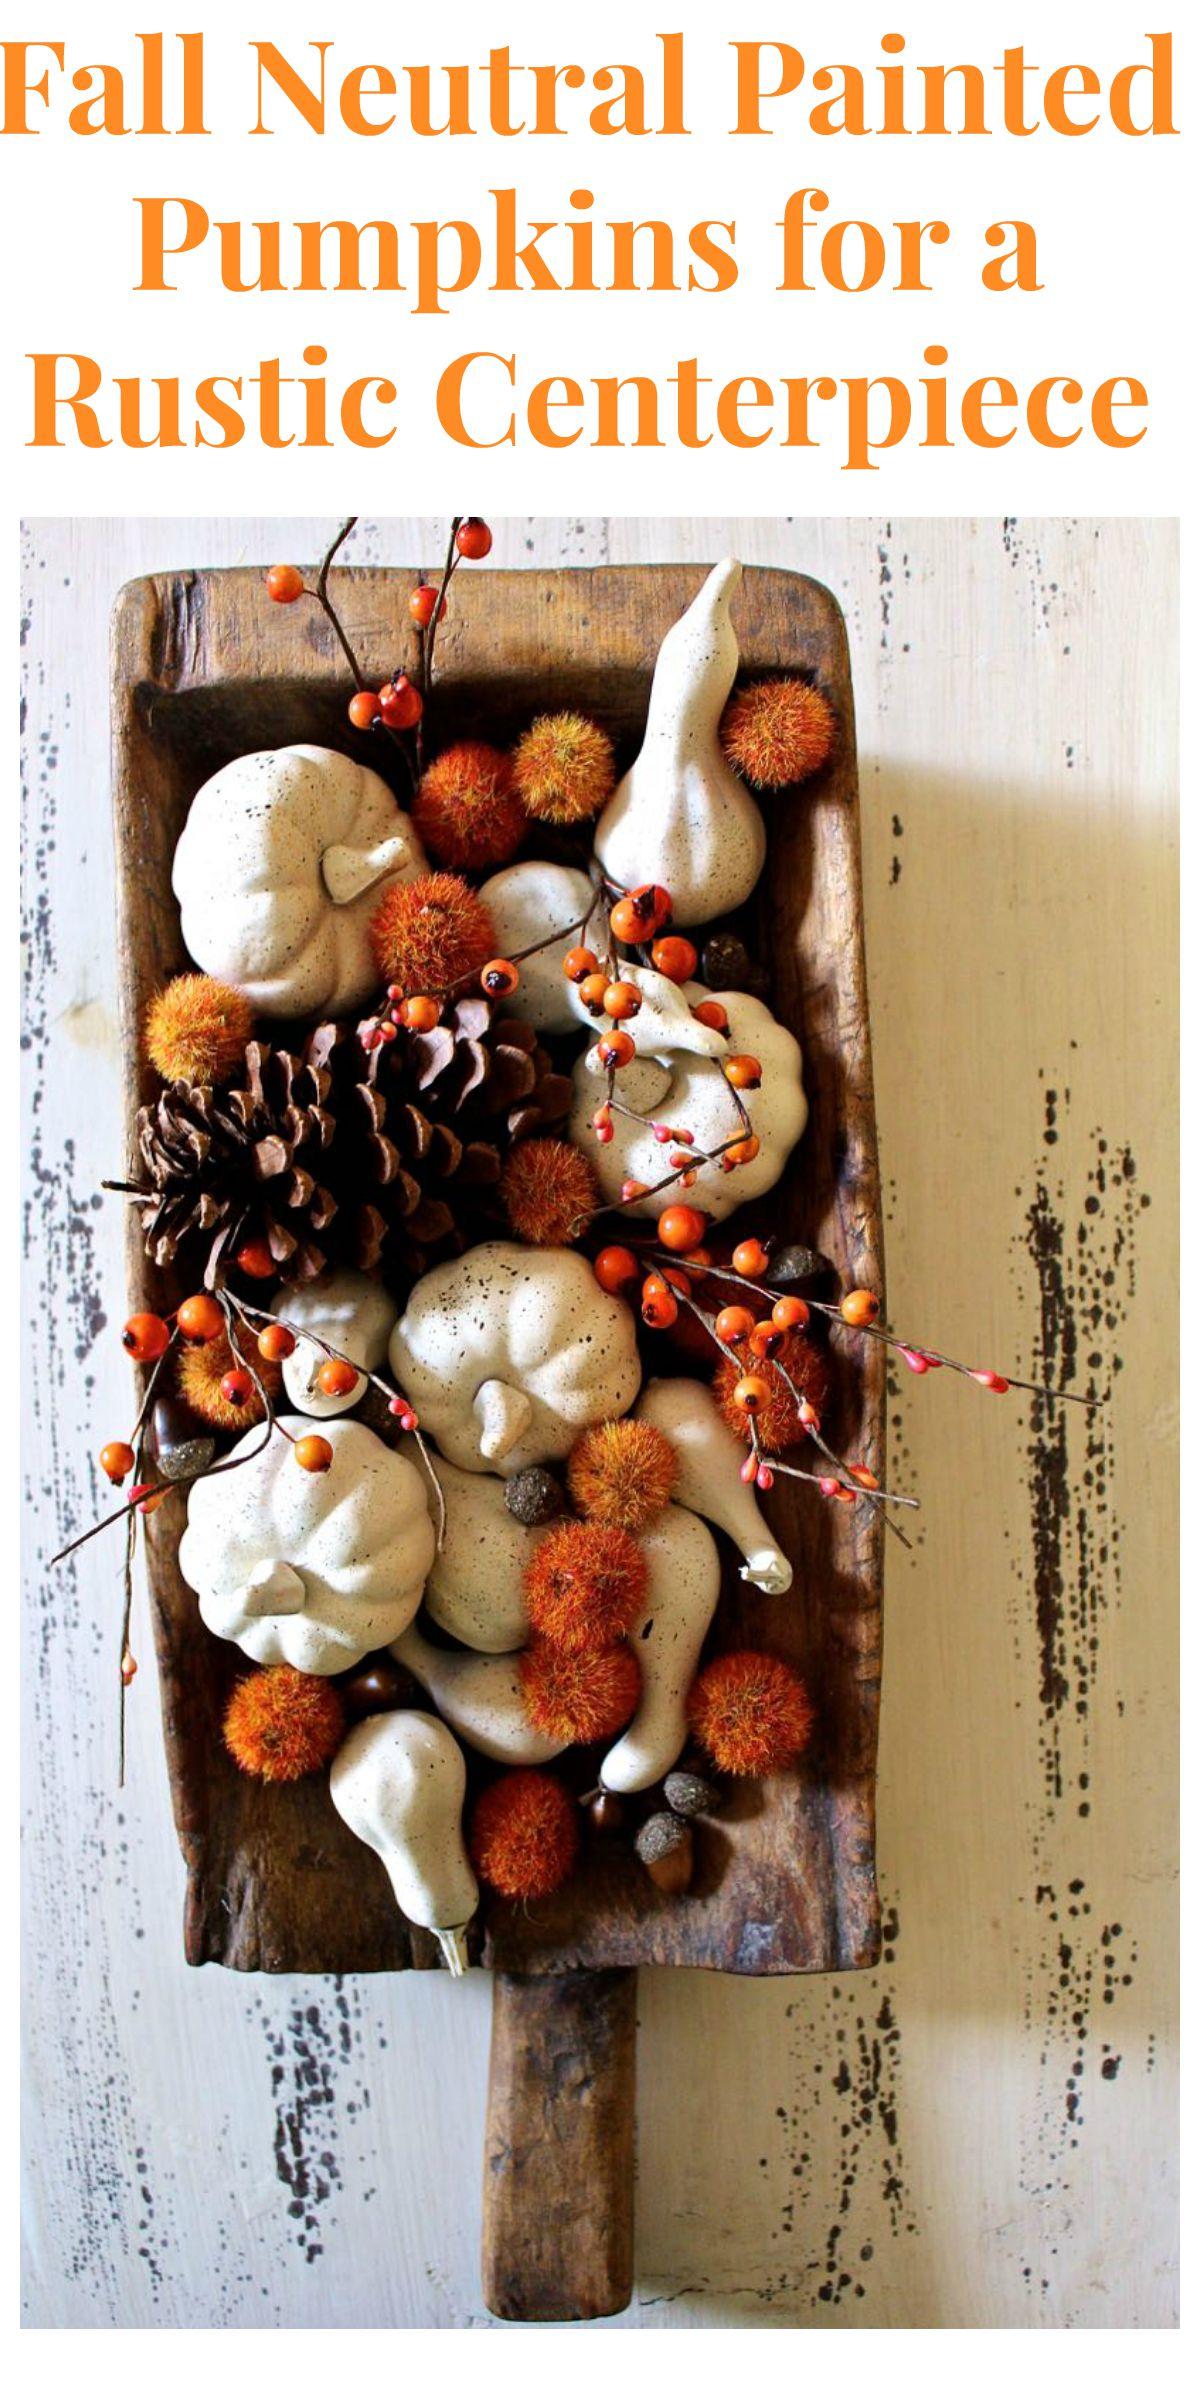 DIY - Fall Neutral Painted Pumpkins.